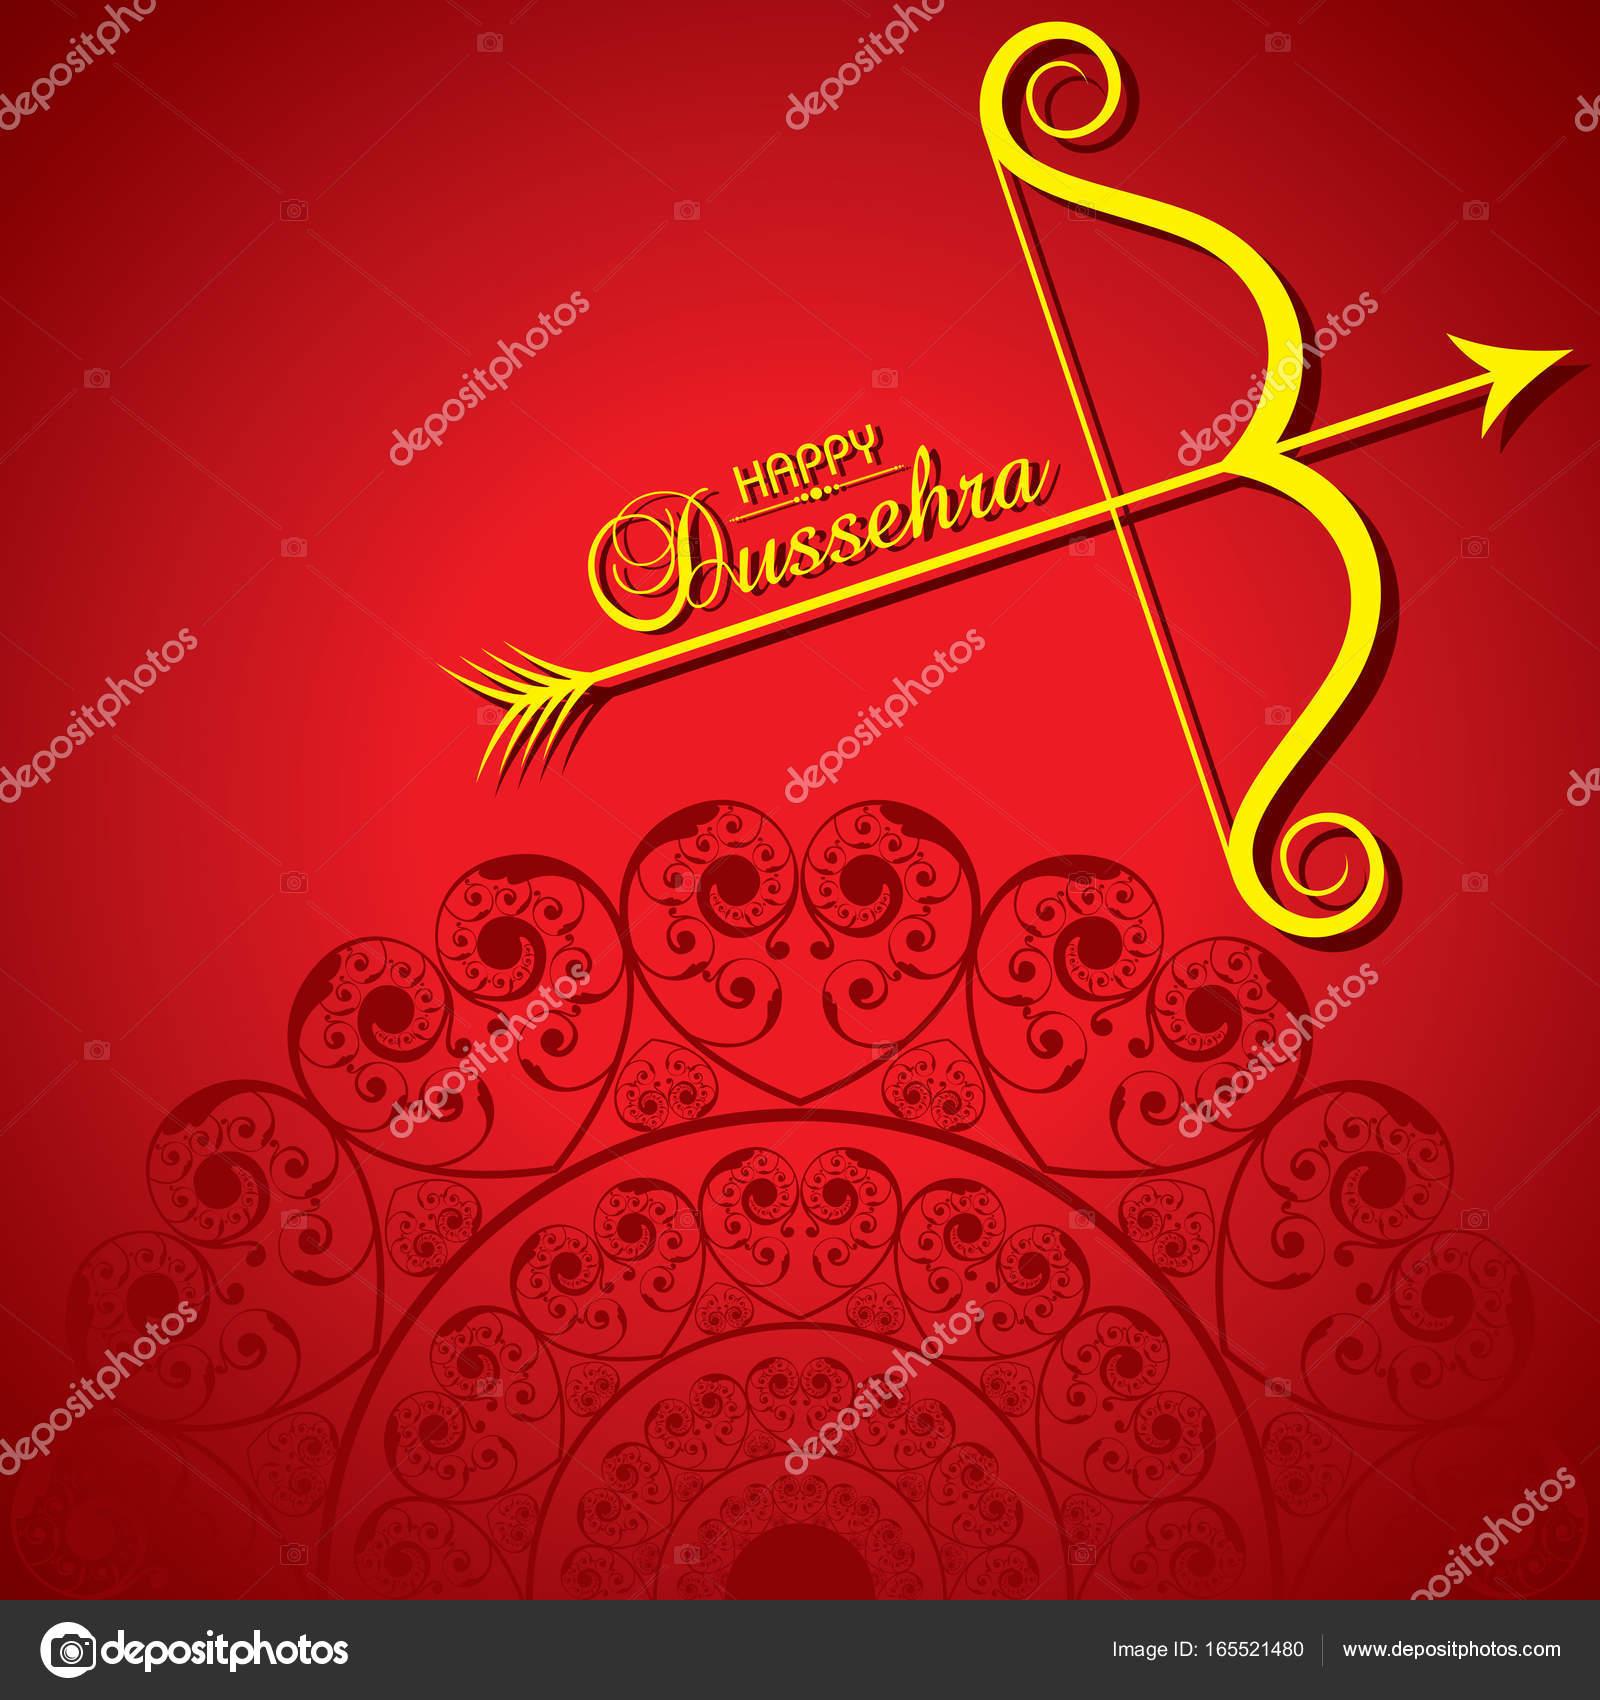 Dussehra Festival Greeting Or Poster Design Stock Vector